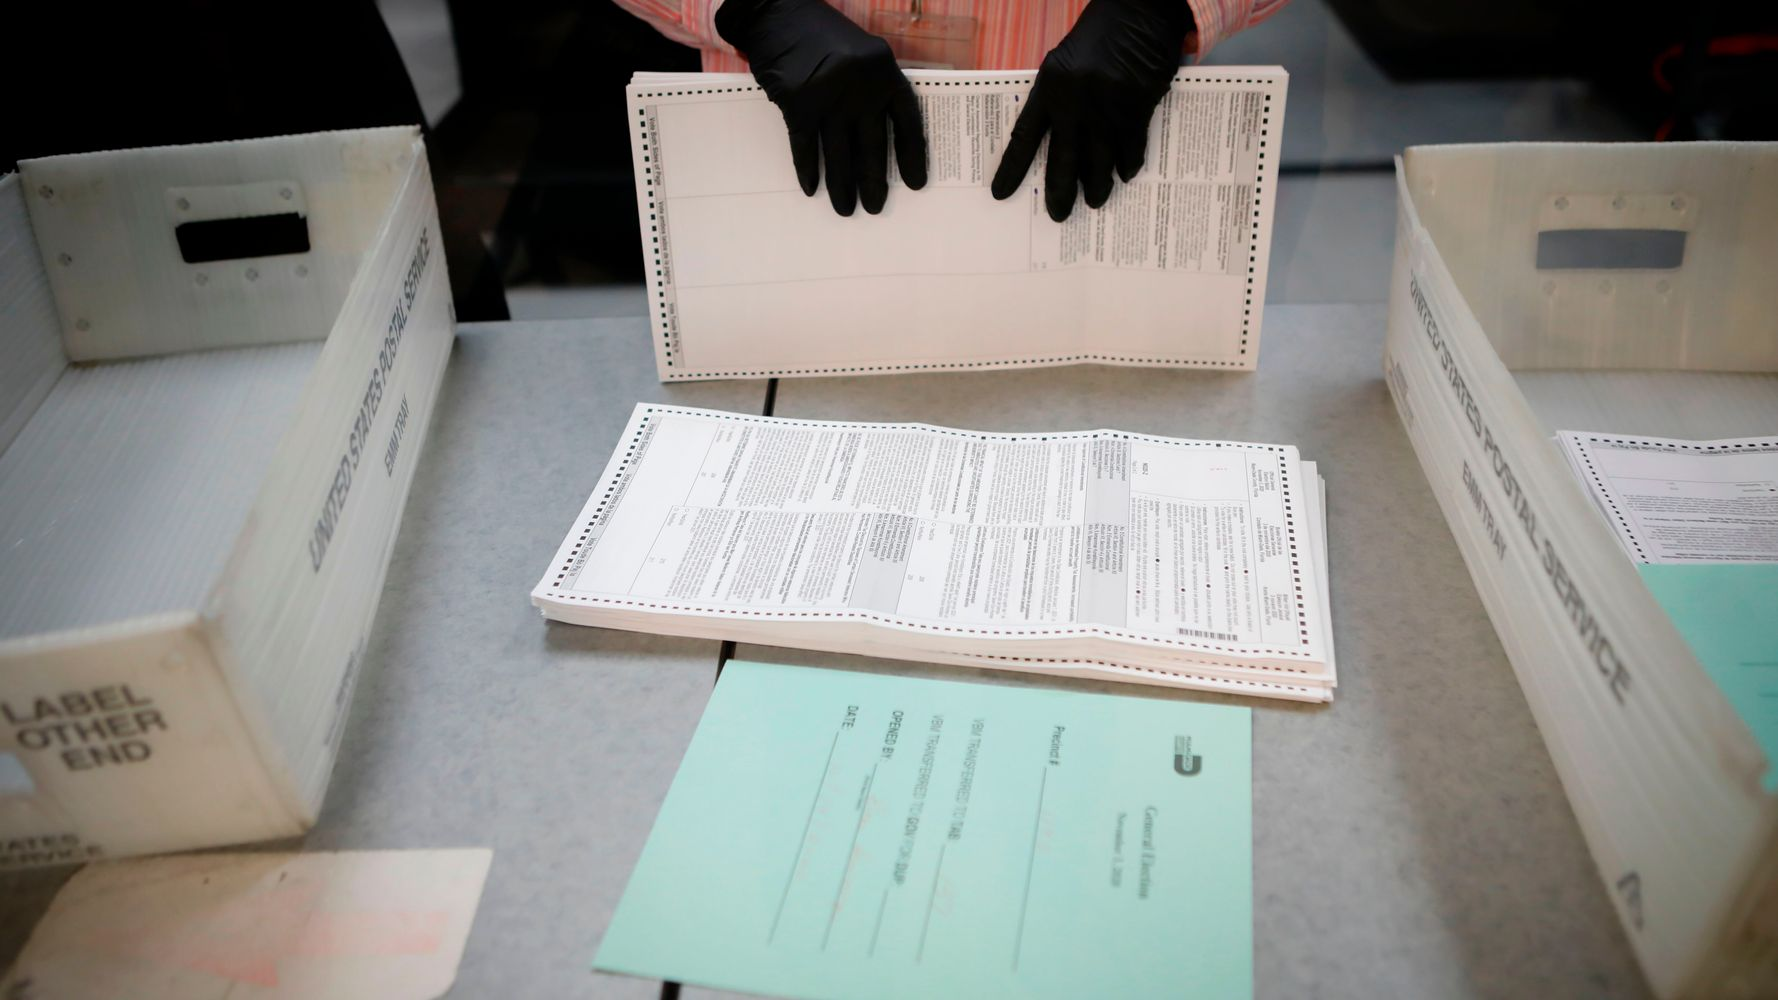 Supreme Court Tie Blocks GOP Effort To Limit Mail-In Voting In Pennsylvania